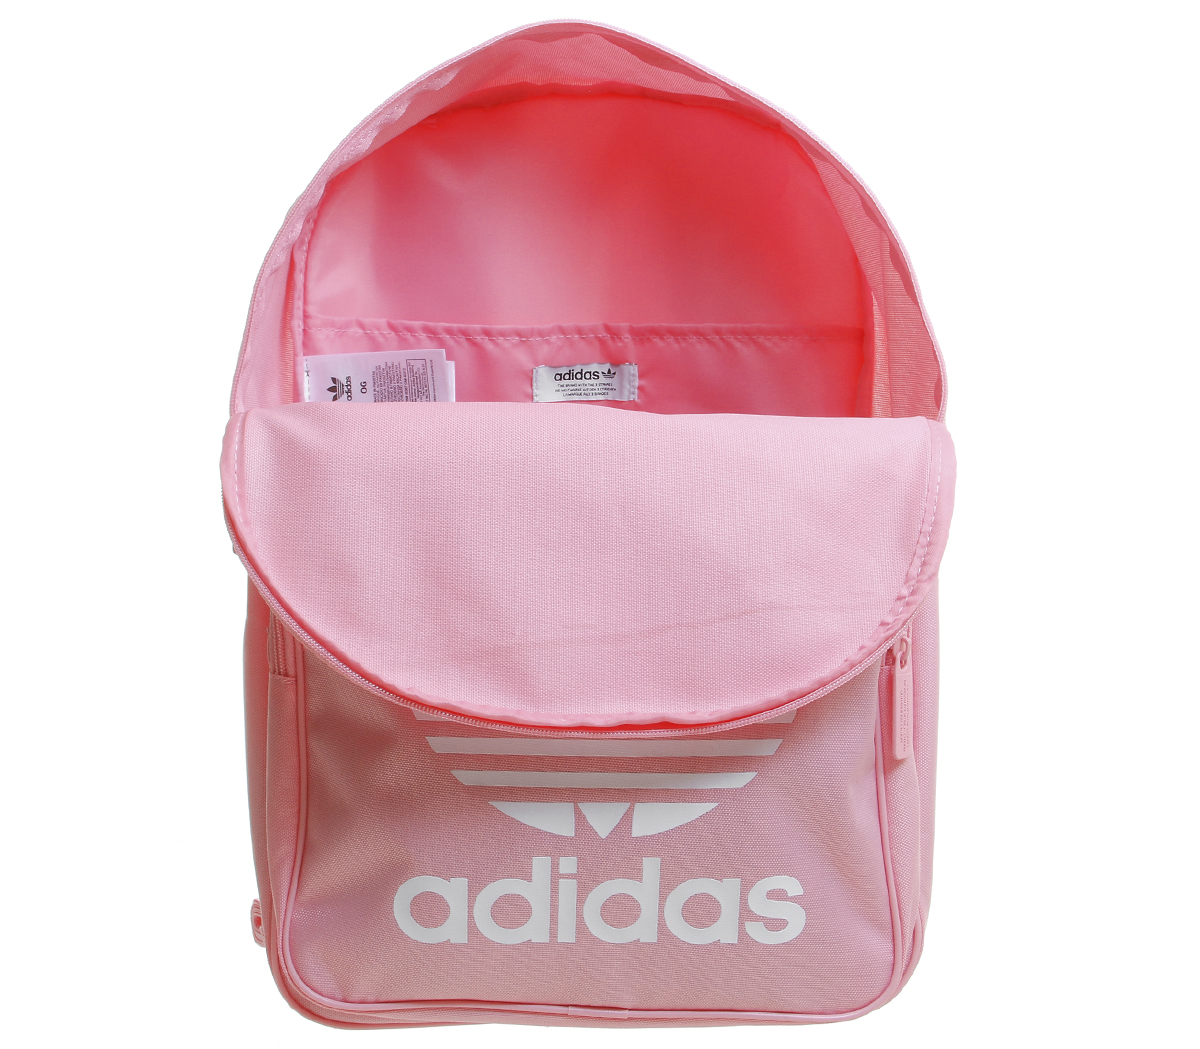 e8c9dfa0b375 Accessories Adidas Classic Trefoil Backpacks Light Pink Accessories ...